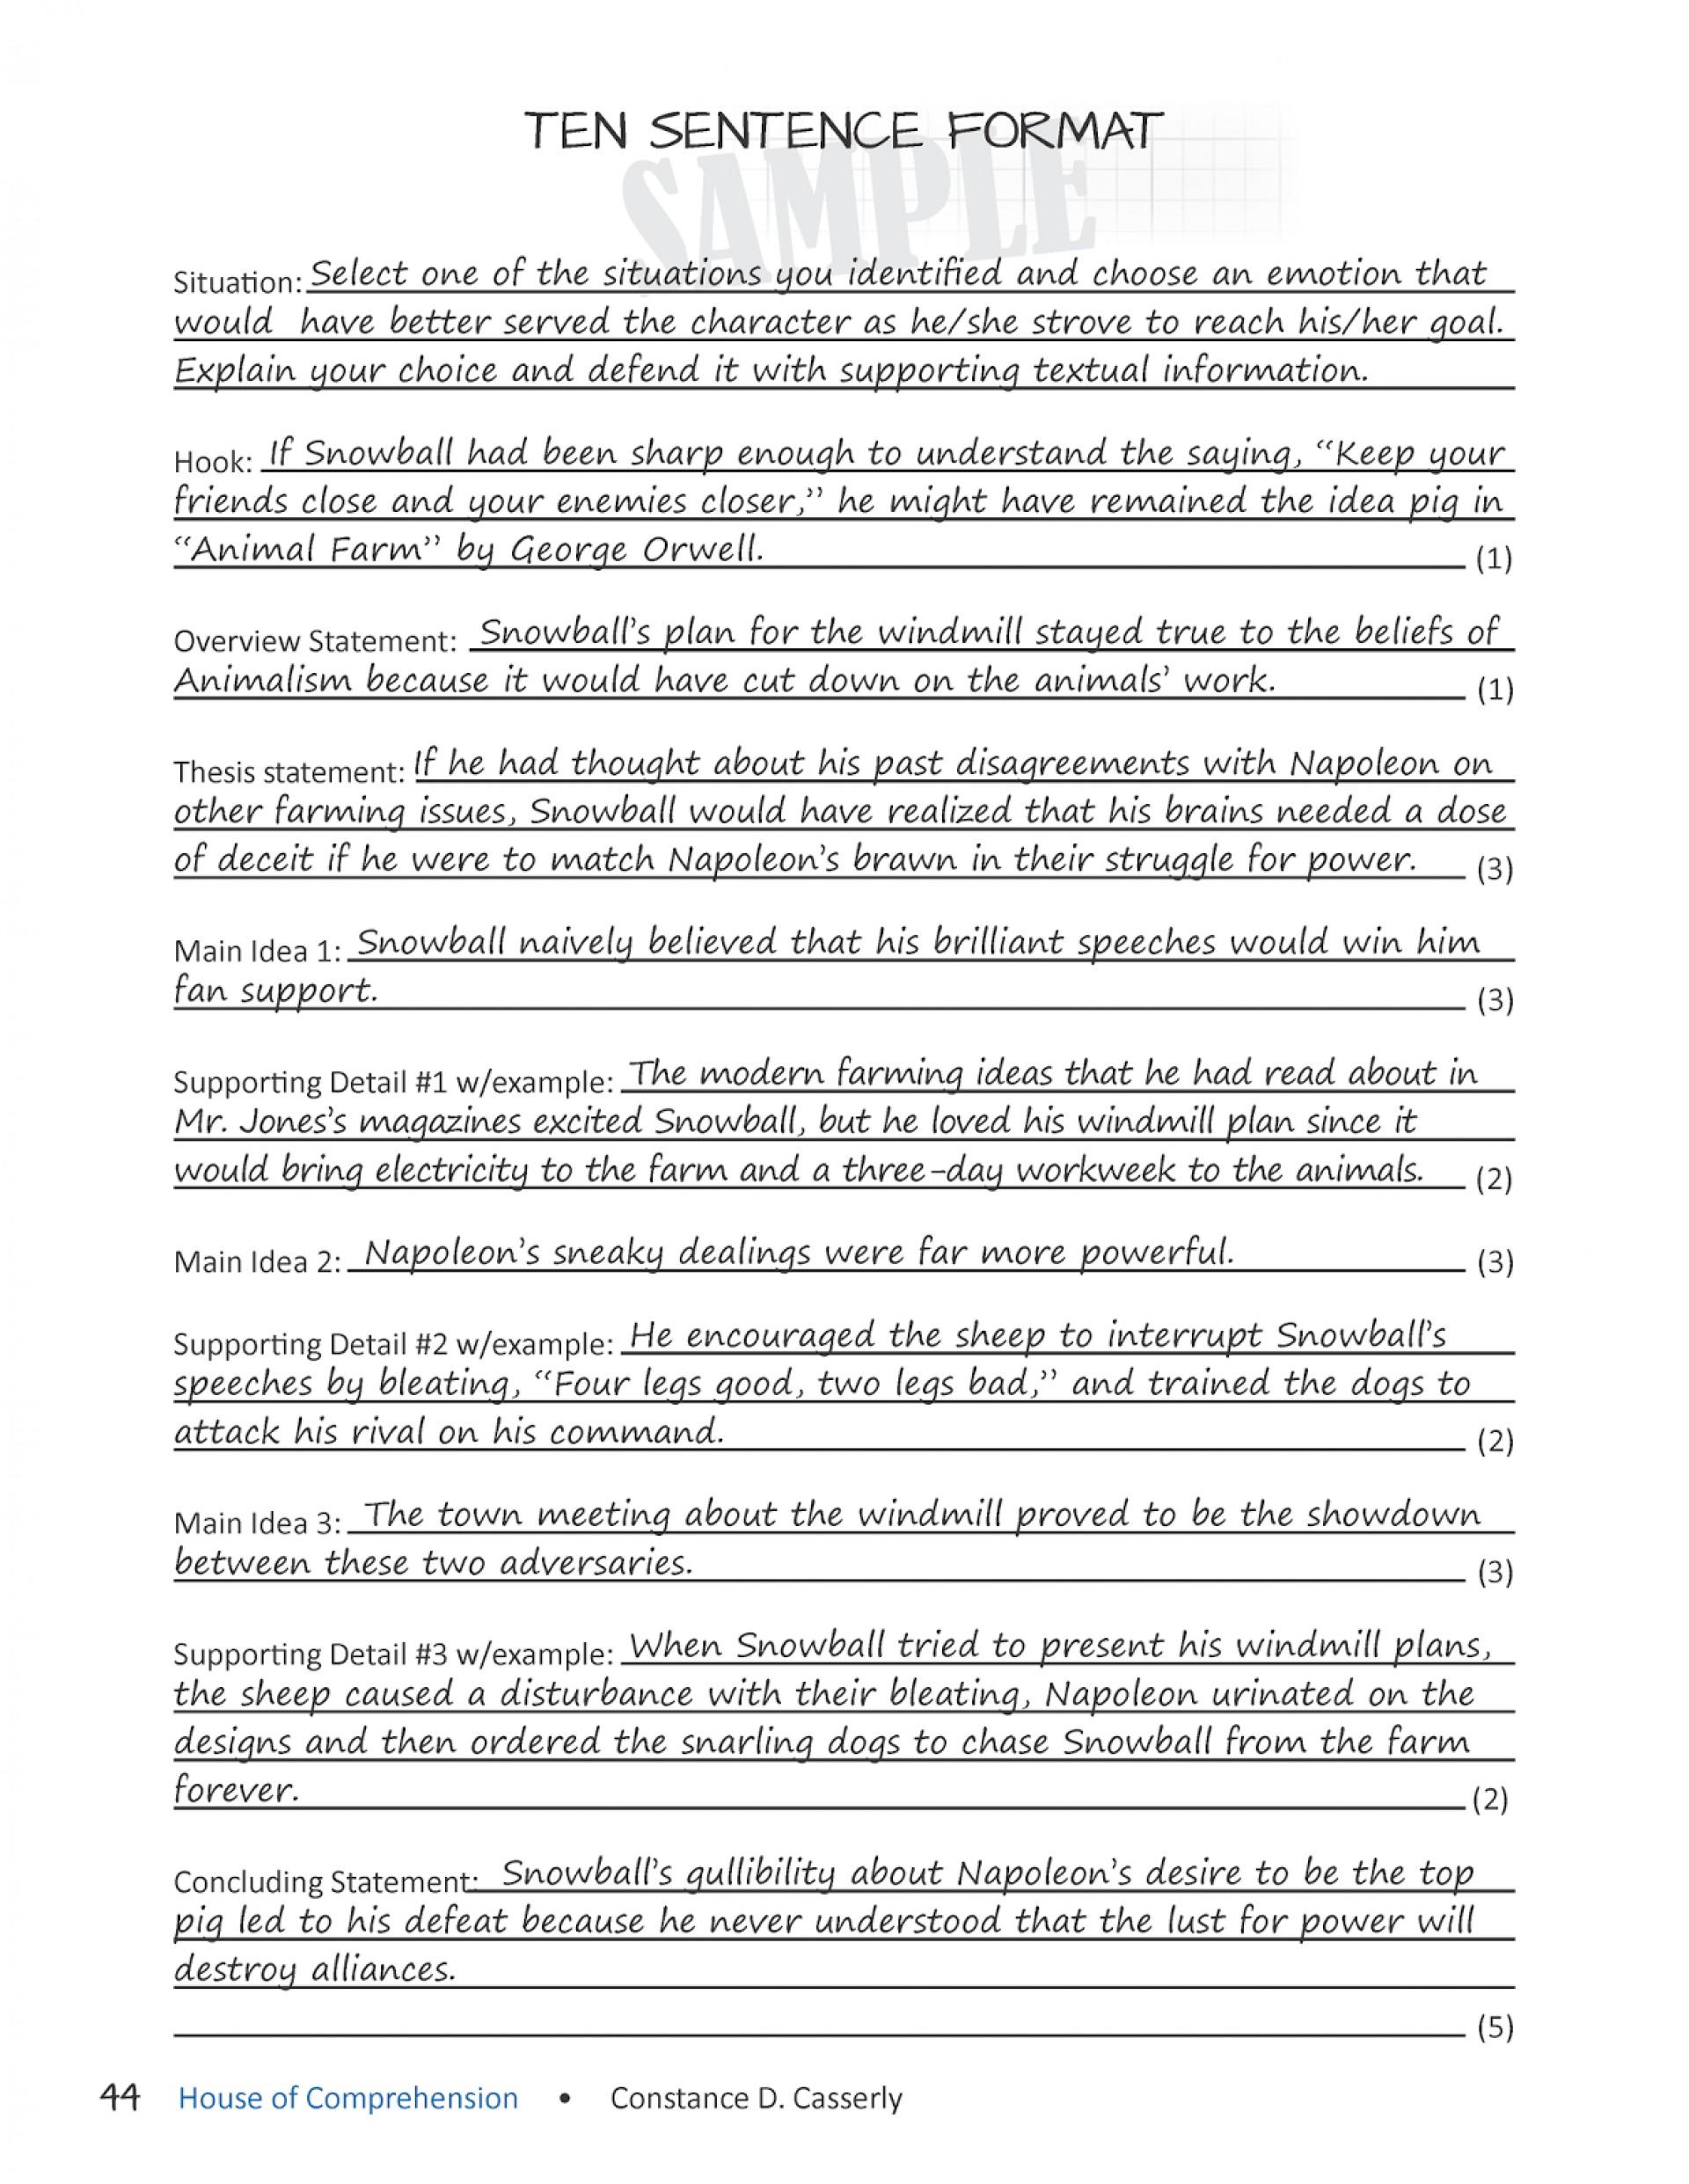 017 Languageartscomprehensionchecktensentenceformat25252b252525252812525252529 Page 5 Essay Example Thesis Stirring Statement Descriptive Examples Definition Structure 1920